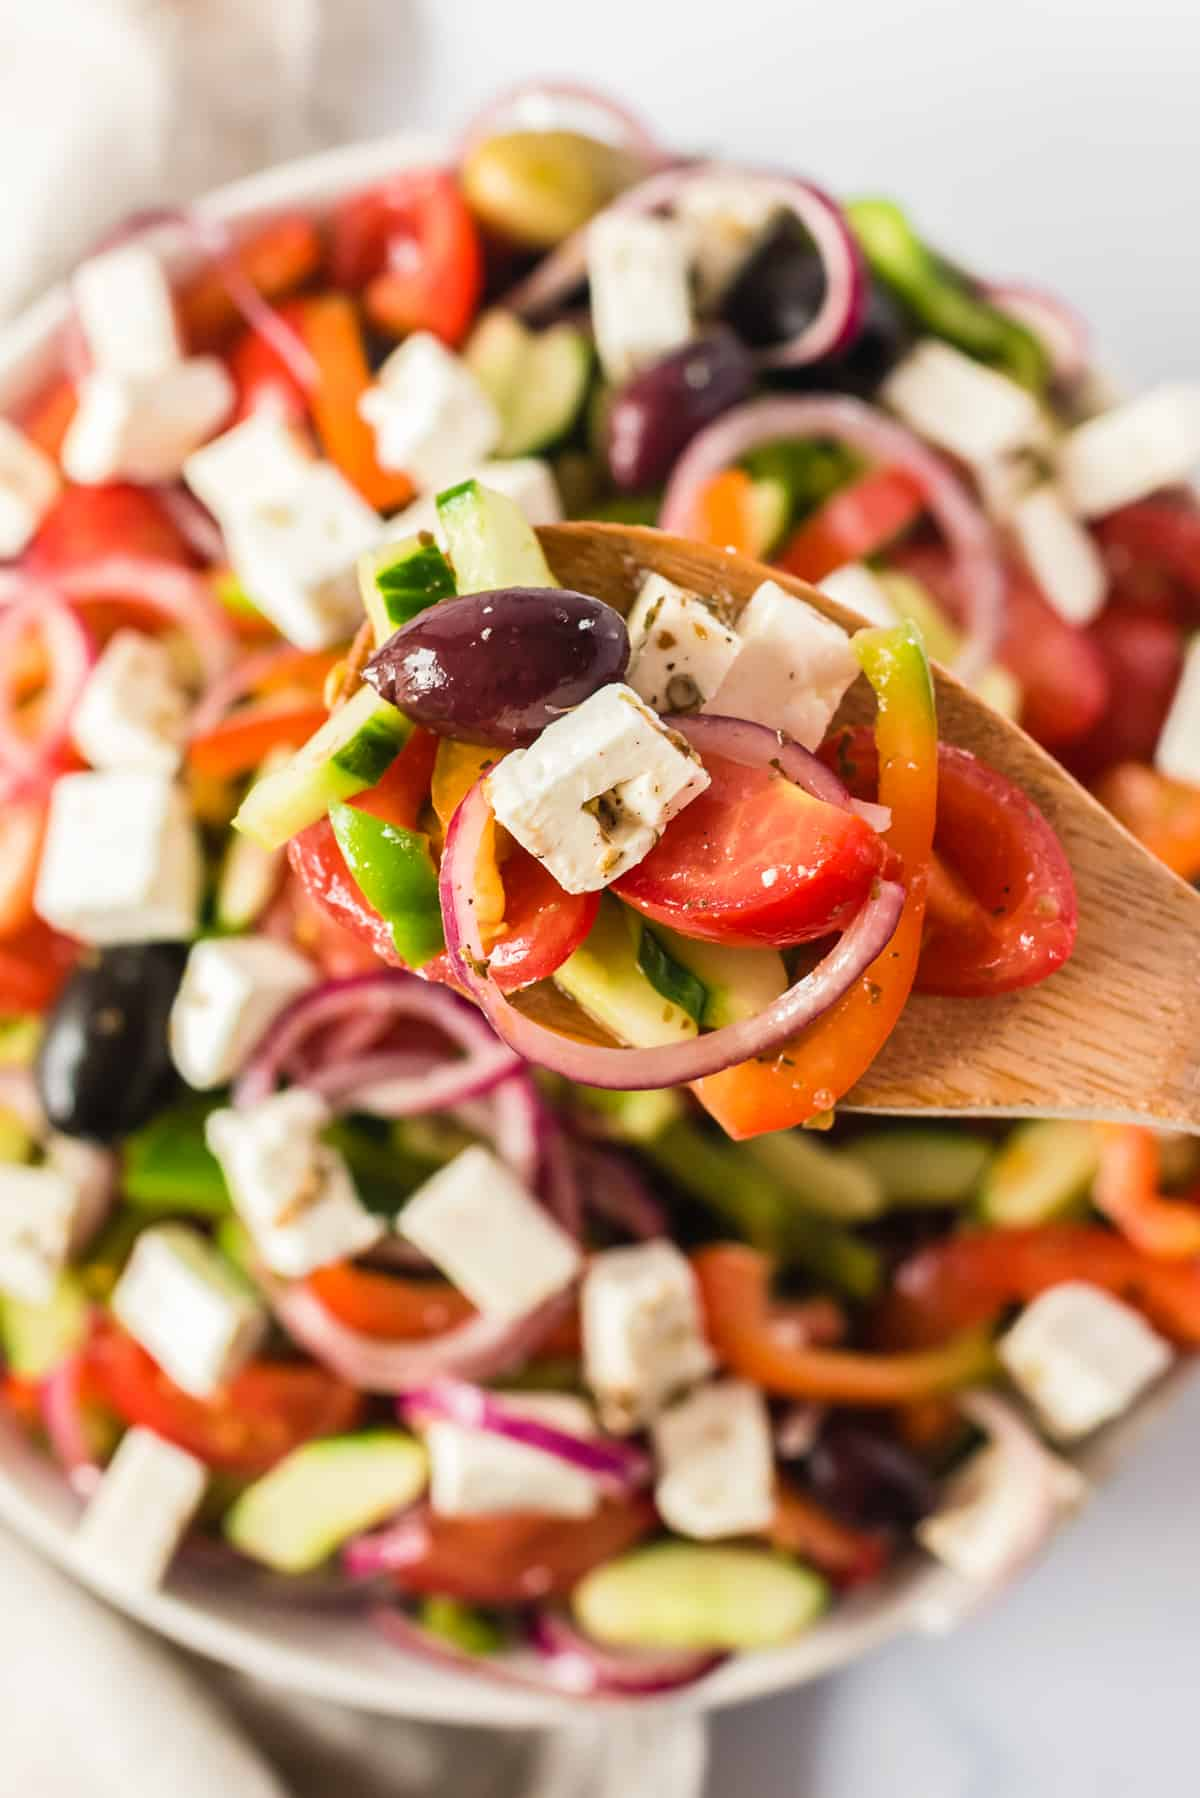 spoon lifting up traditional greek salad ingredients